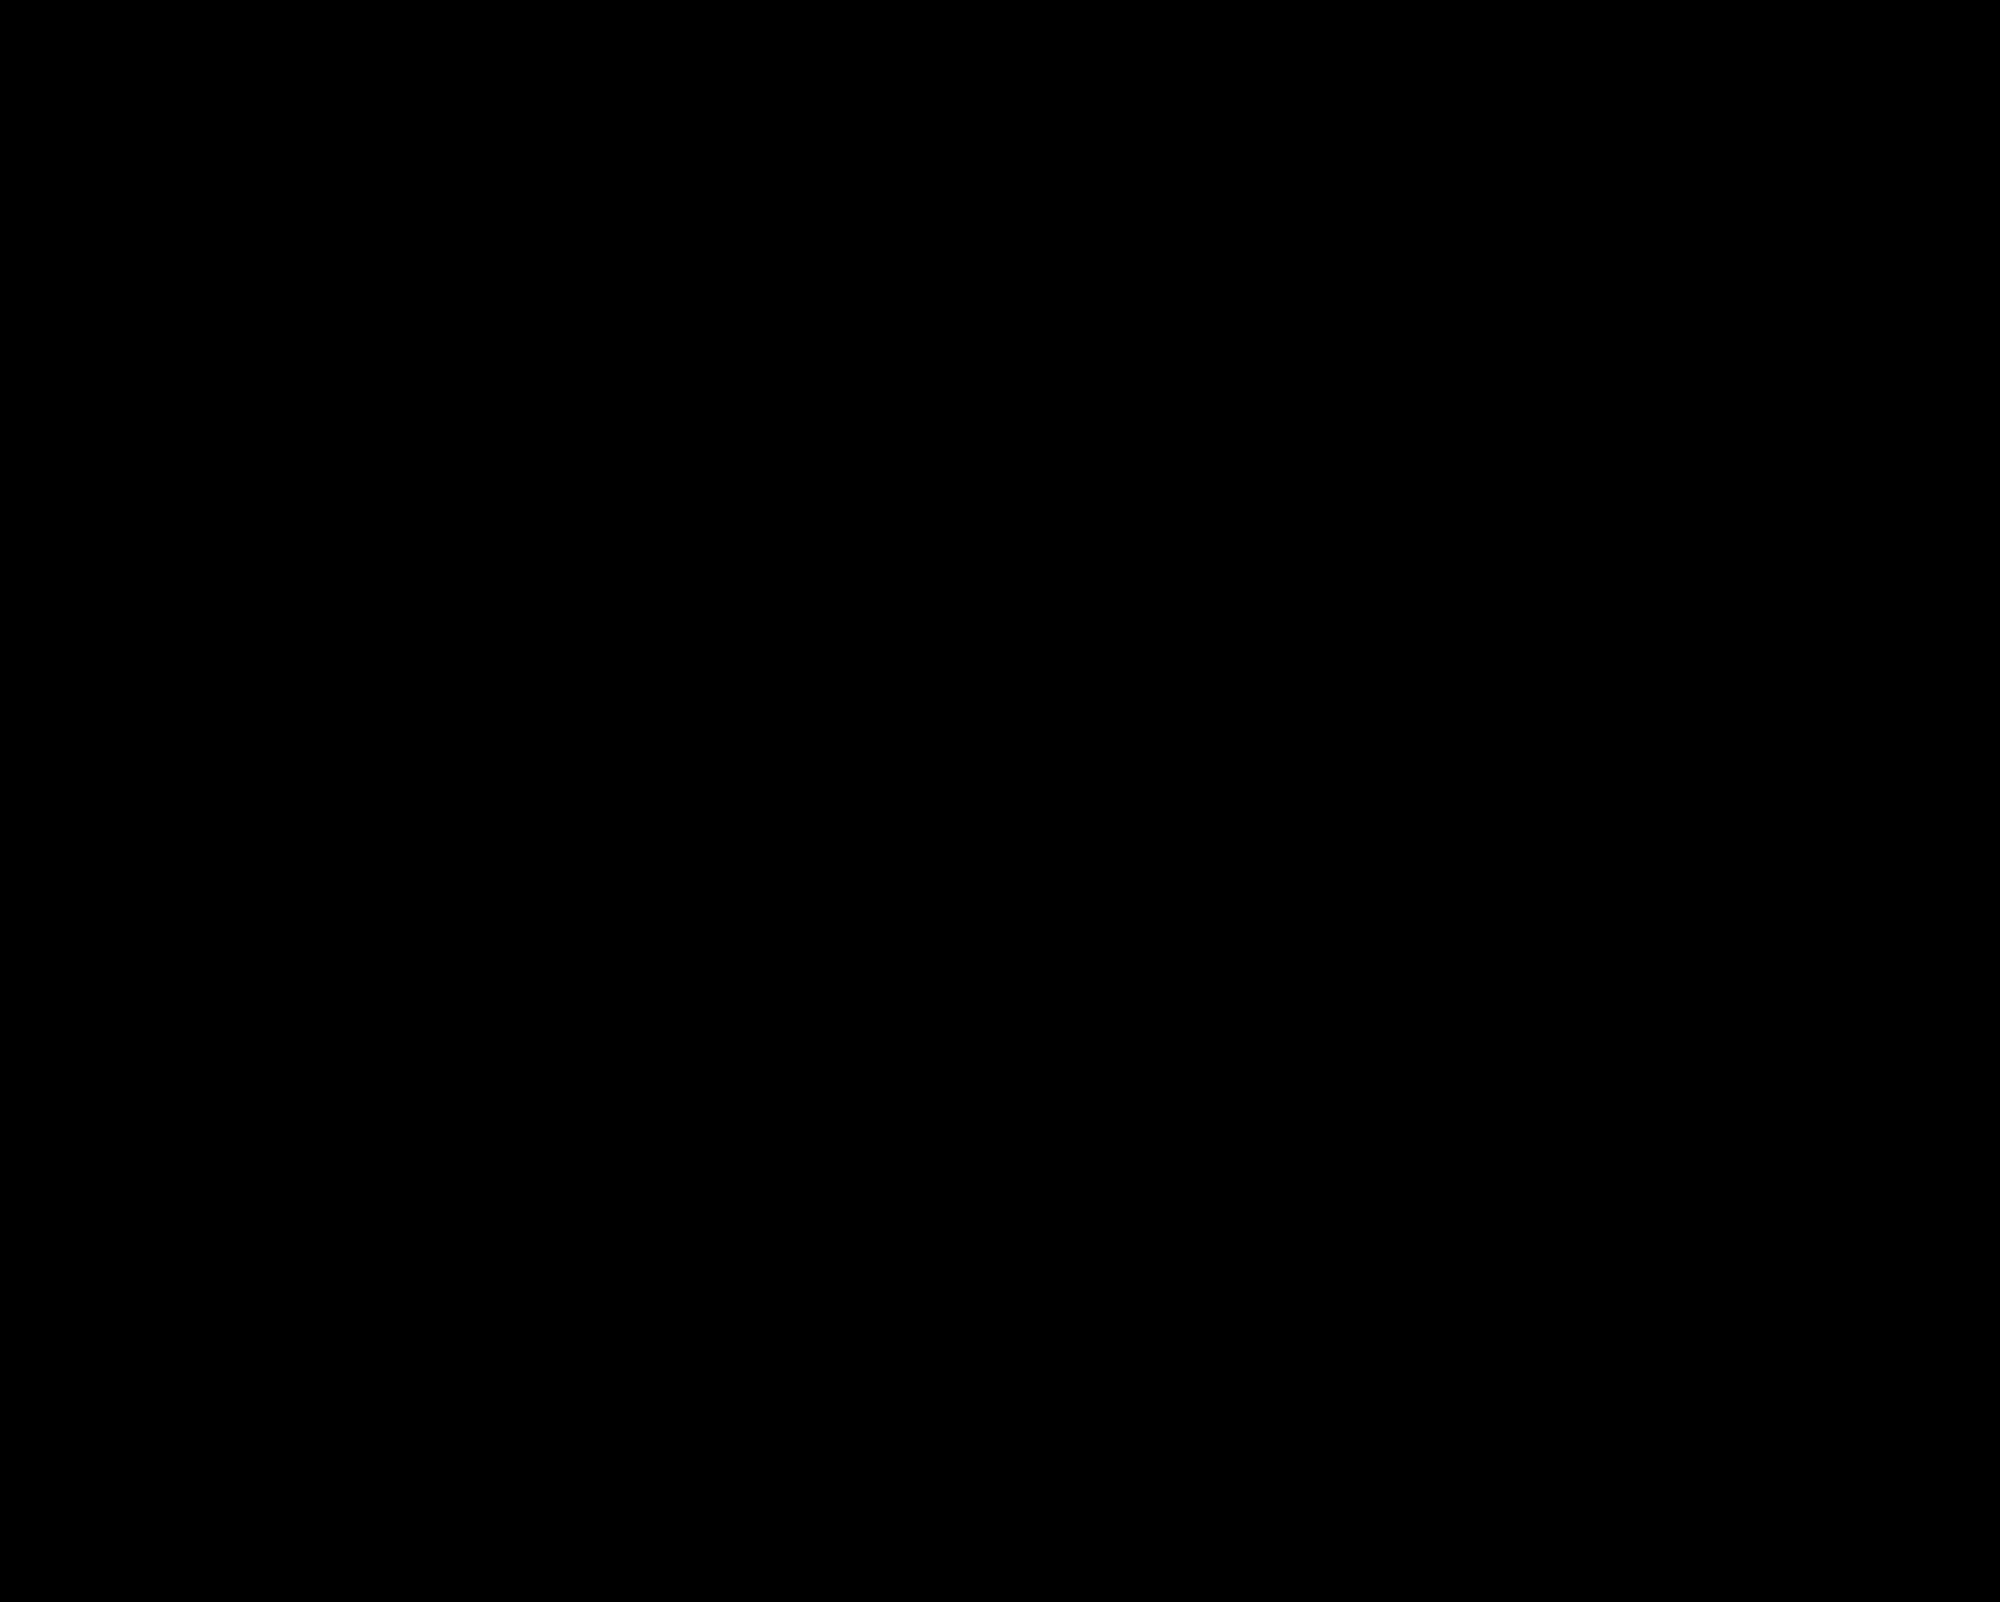 2000x1602 Fileportugal Svg Element For World Maps.svg